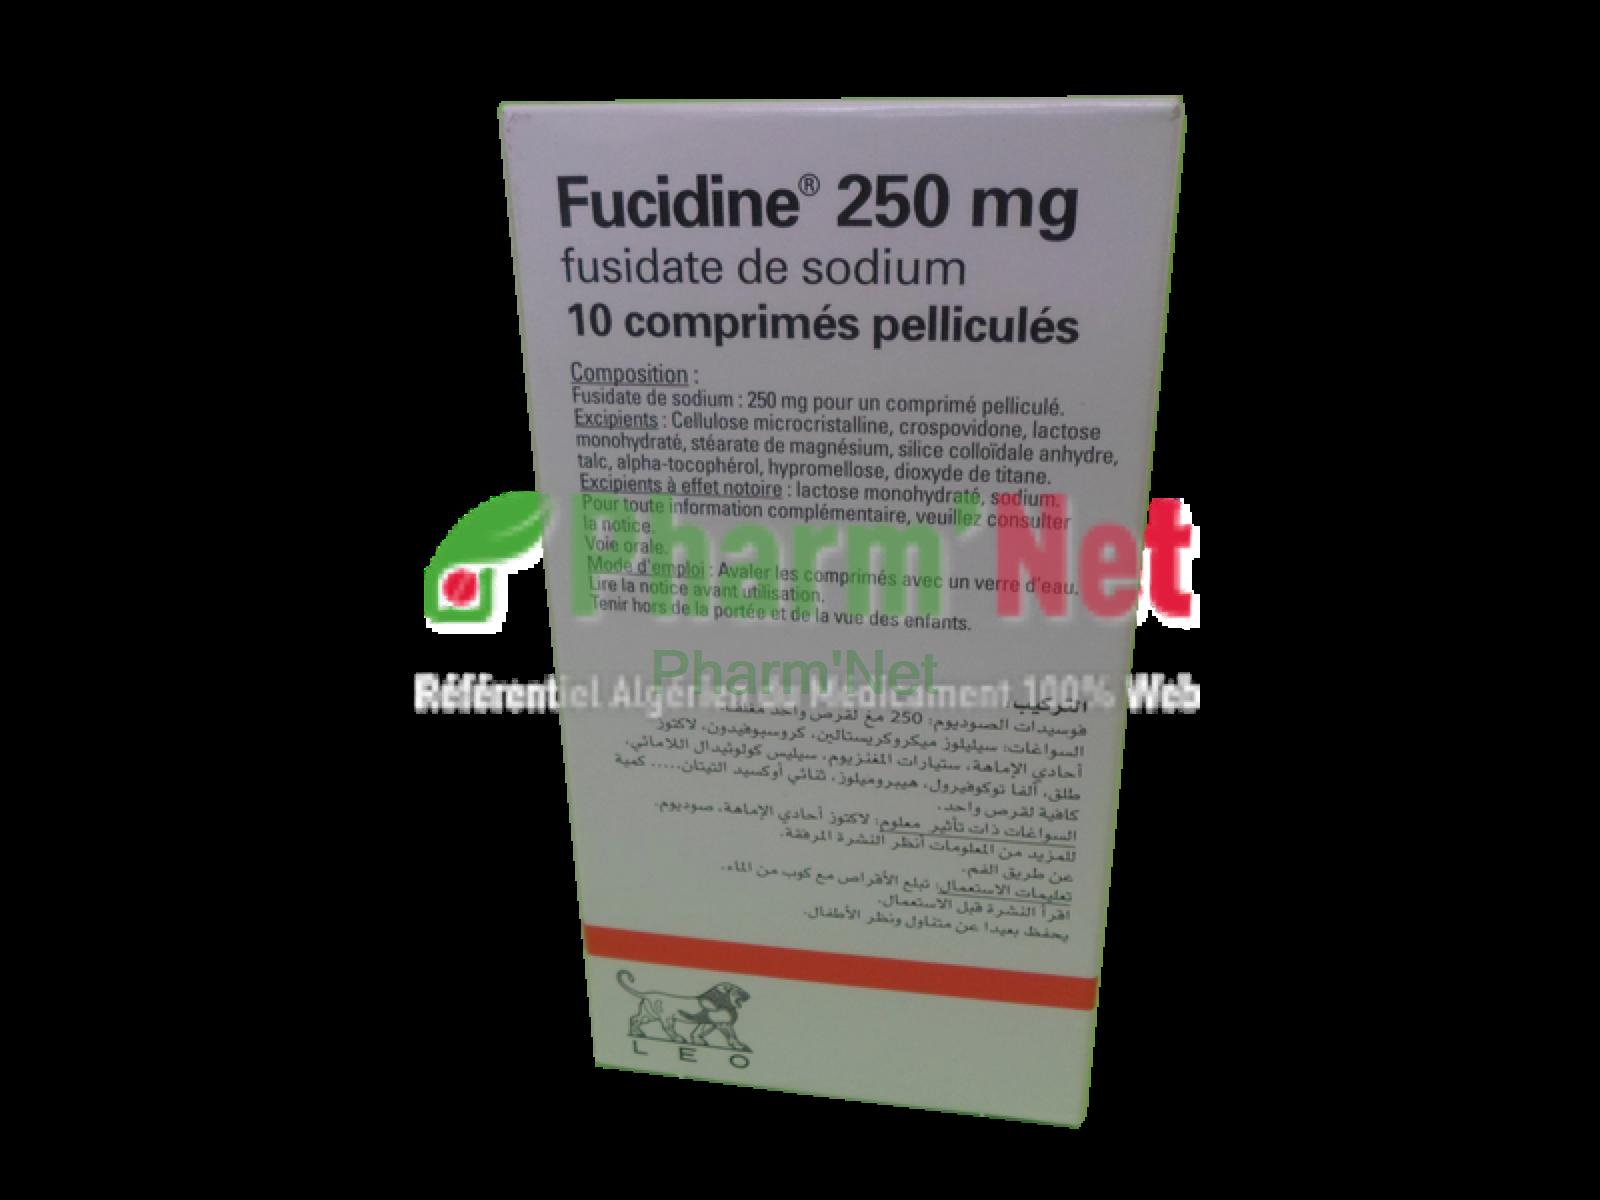 Fucidine 250mg Comp Pelli B 10 Pharmnet Encyclopedie Des Medicaments En Algerie Propriete Sarl Esahti